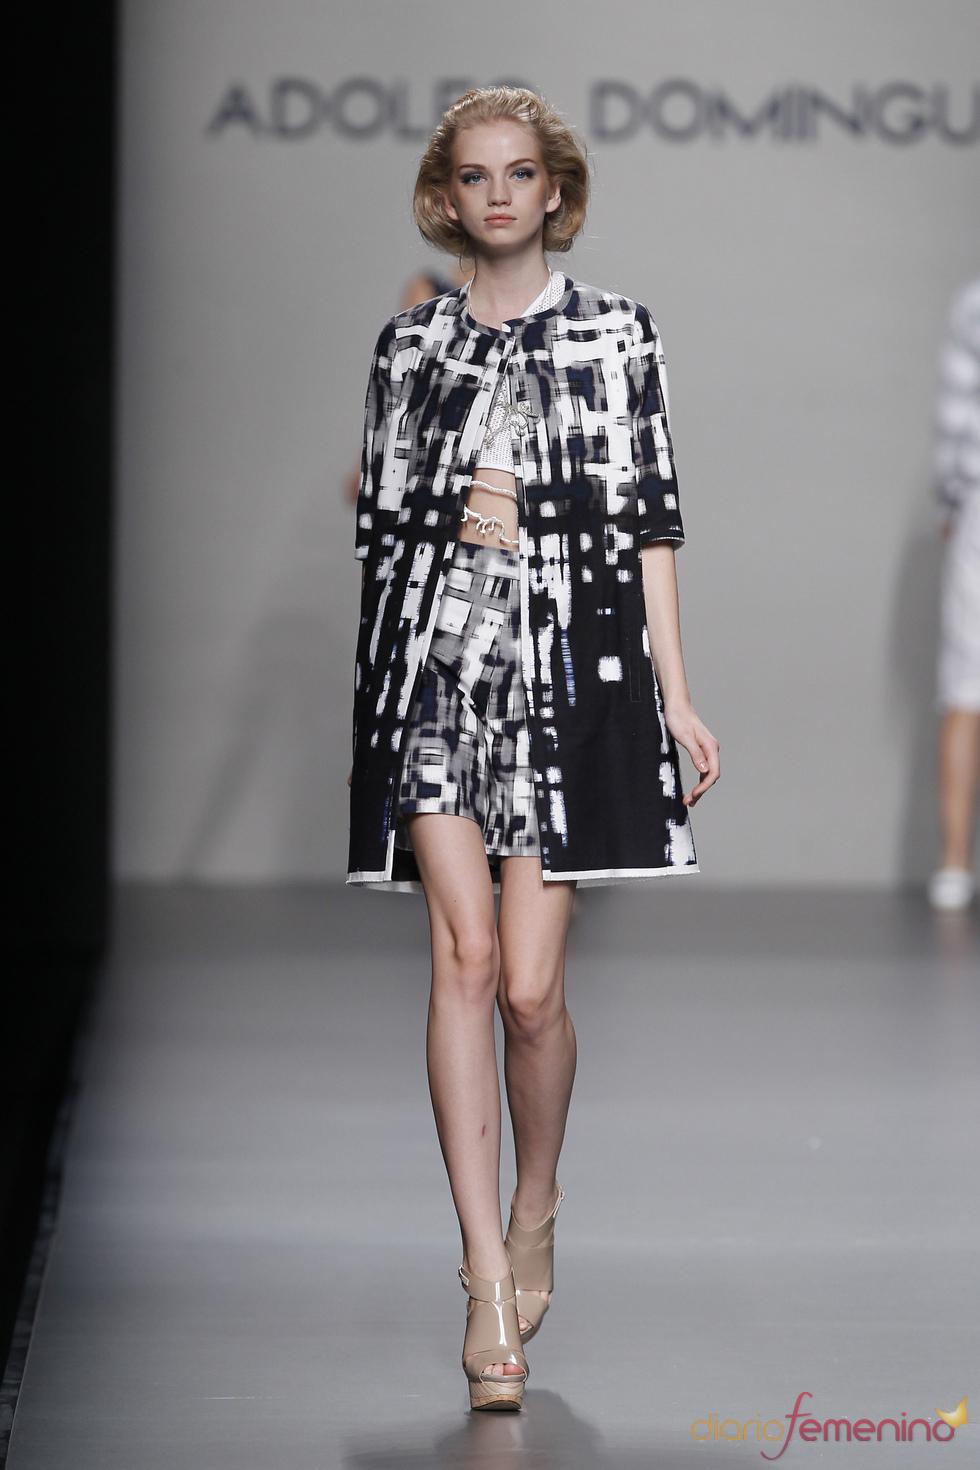 Moda Mujer Primavera Verano 2011 de Adolfo Domínguez